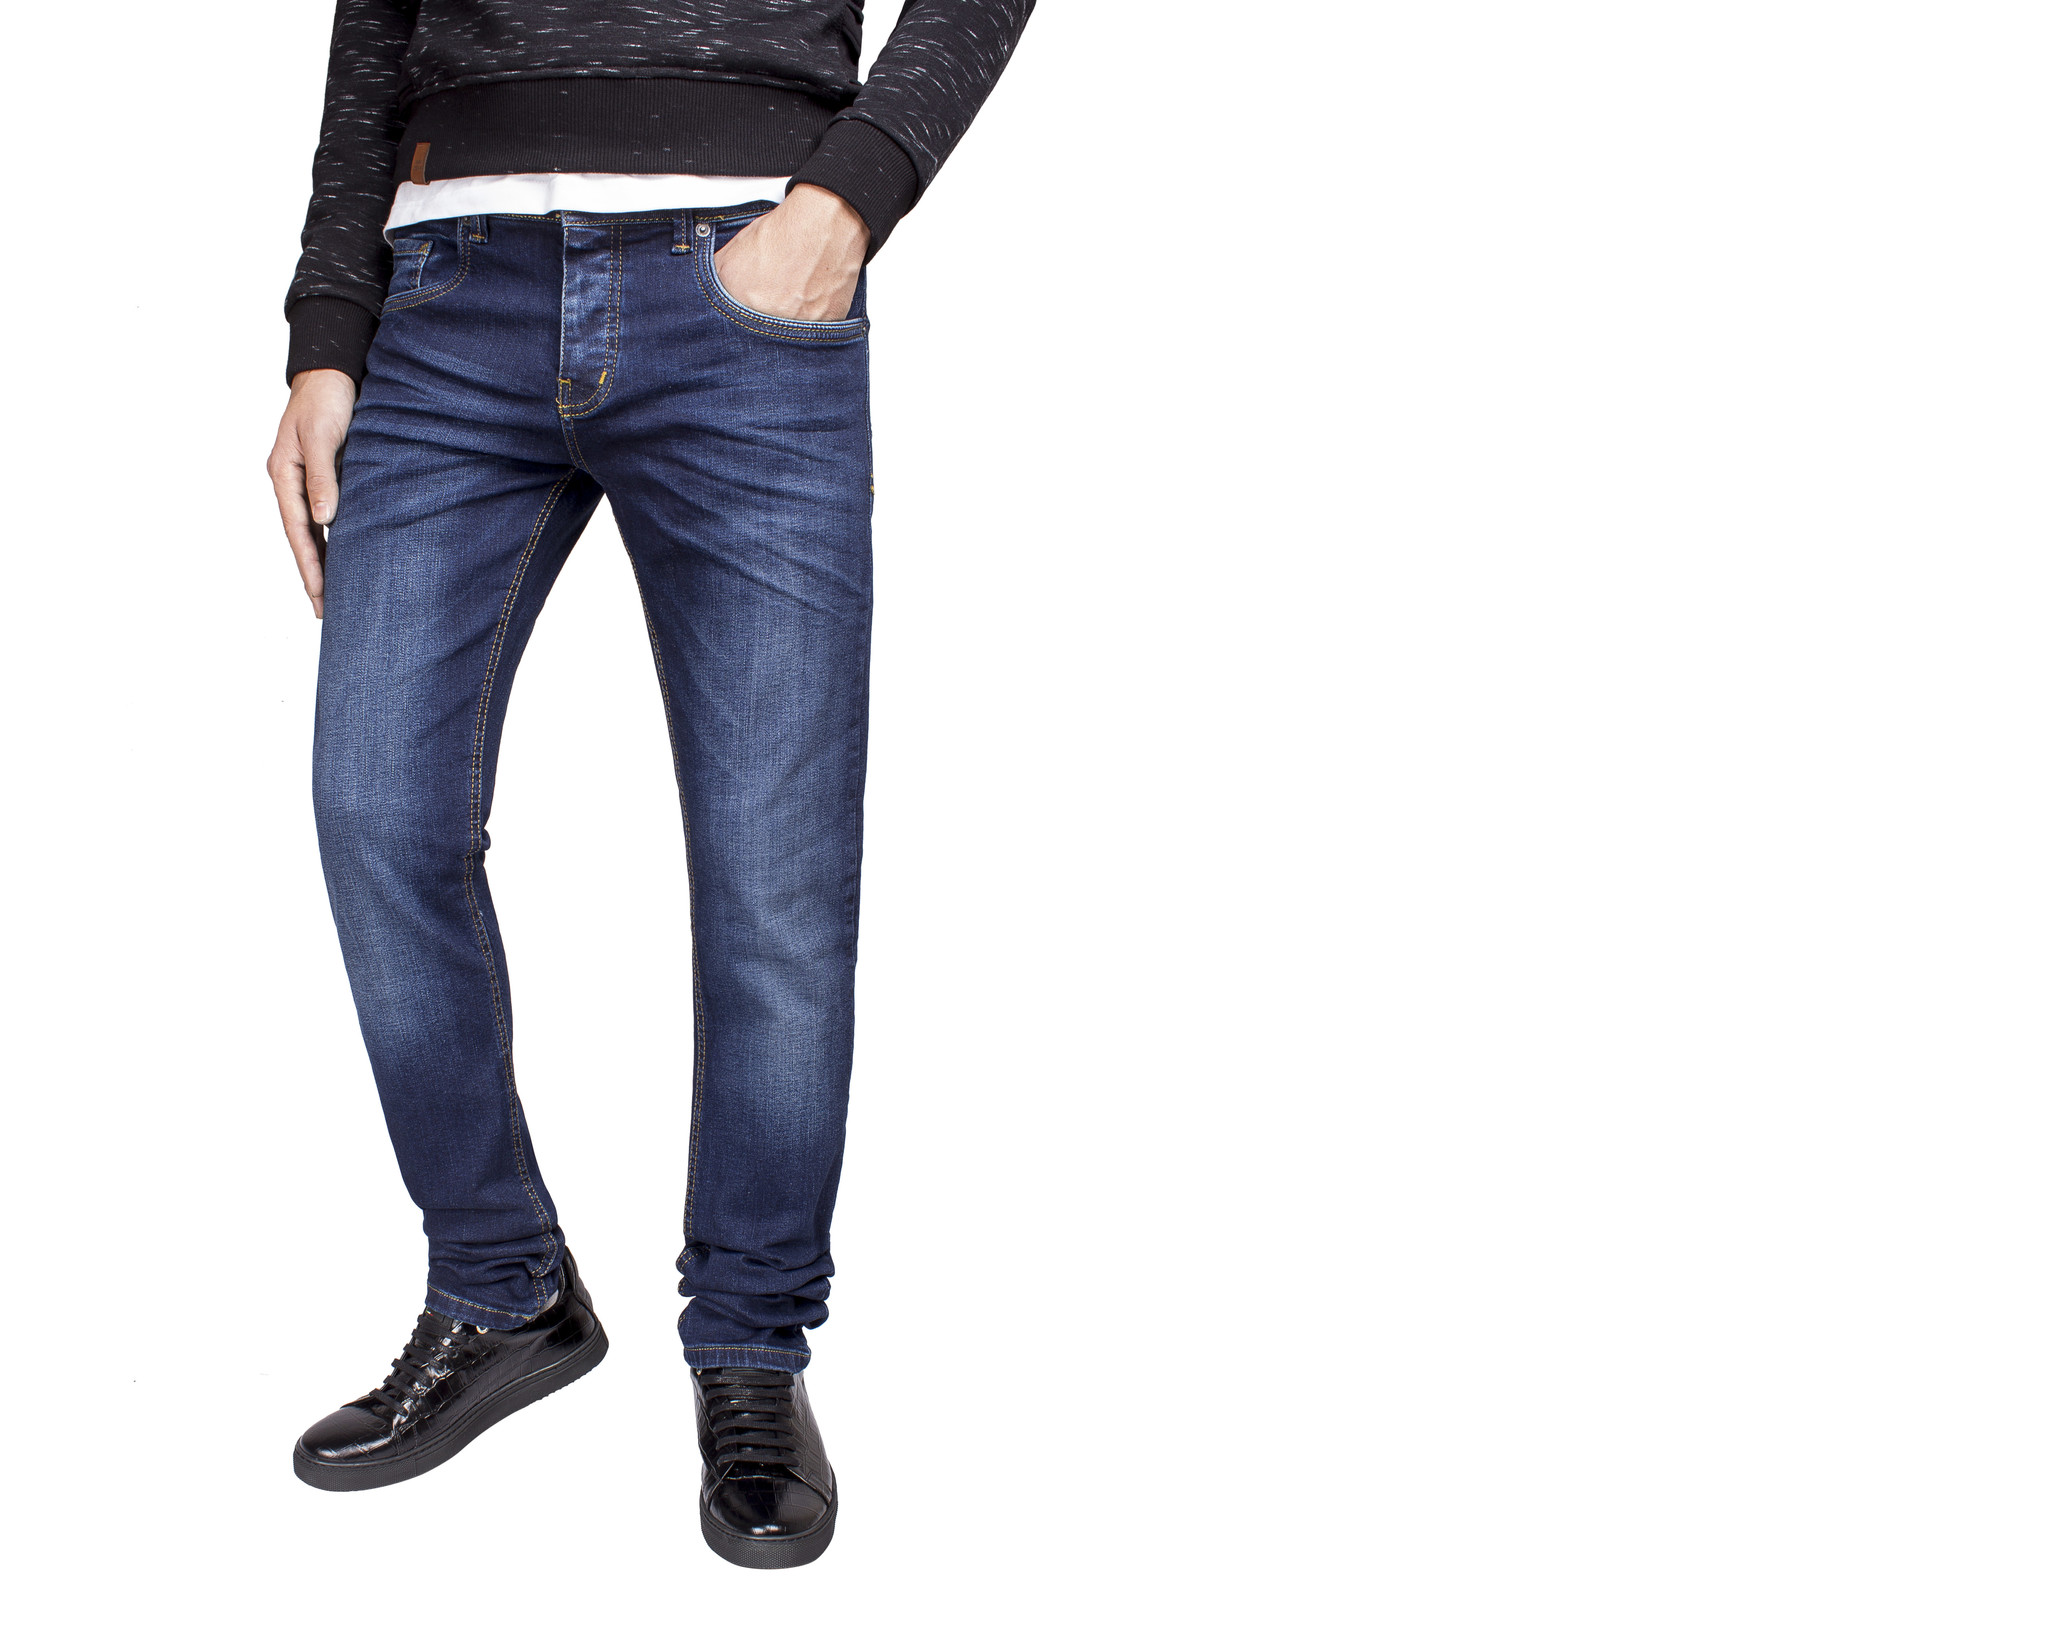 Arya Boy Jeans 8206 Maat: 38/34